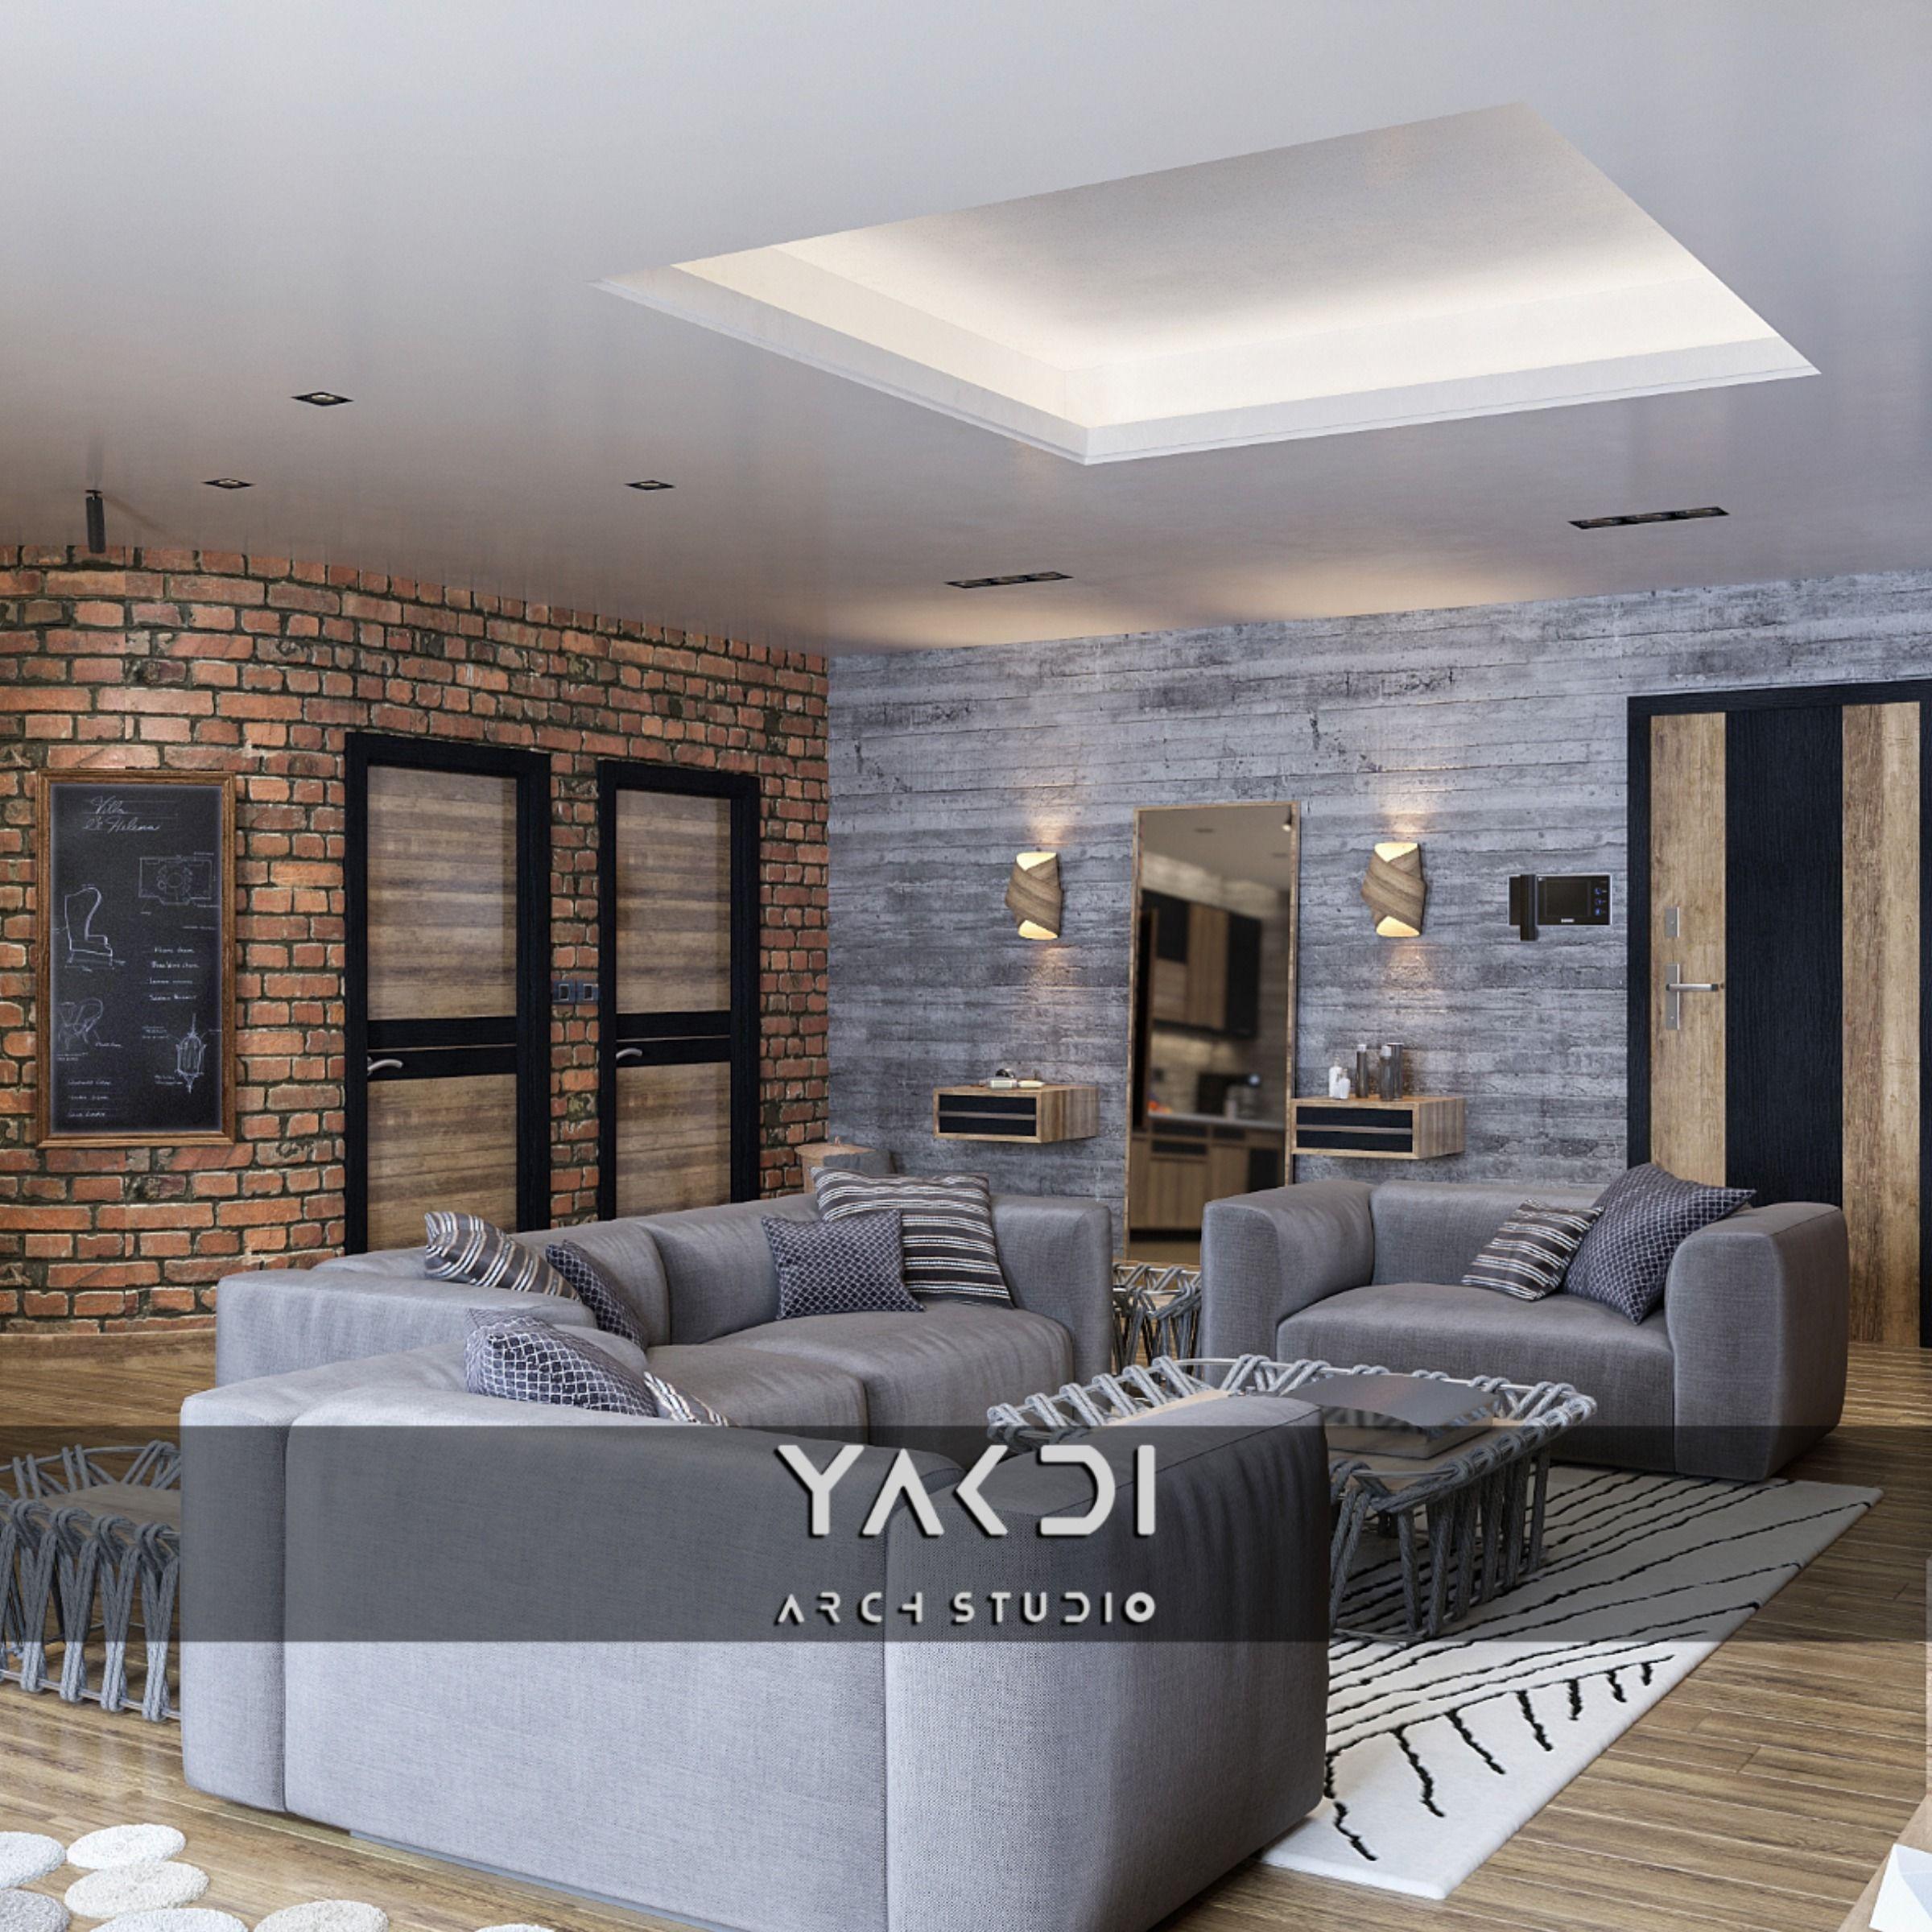 Salon صالة معيشة 2017 Interiors Interior Design Design